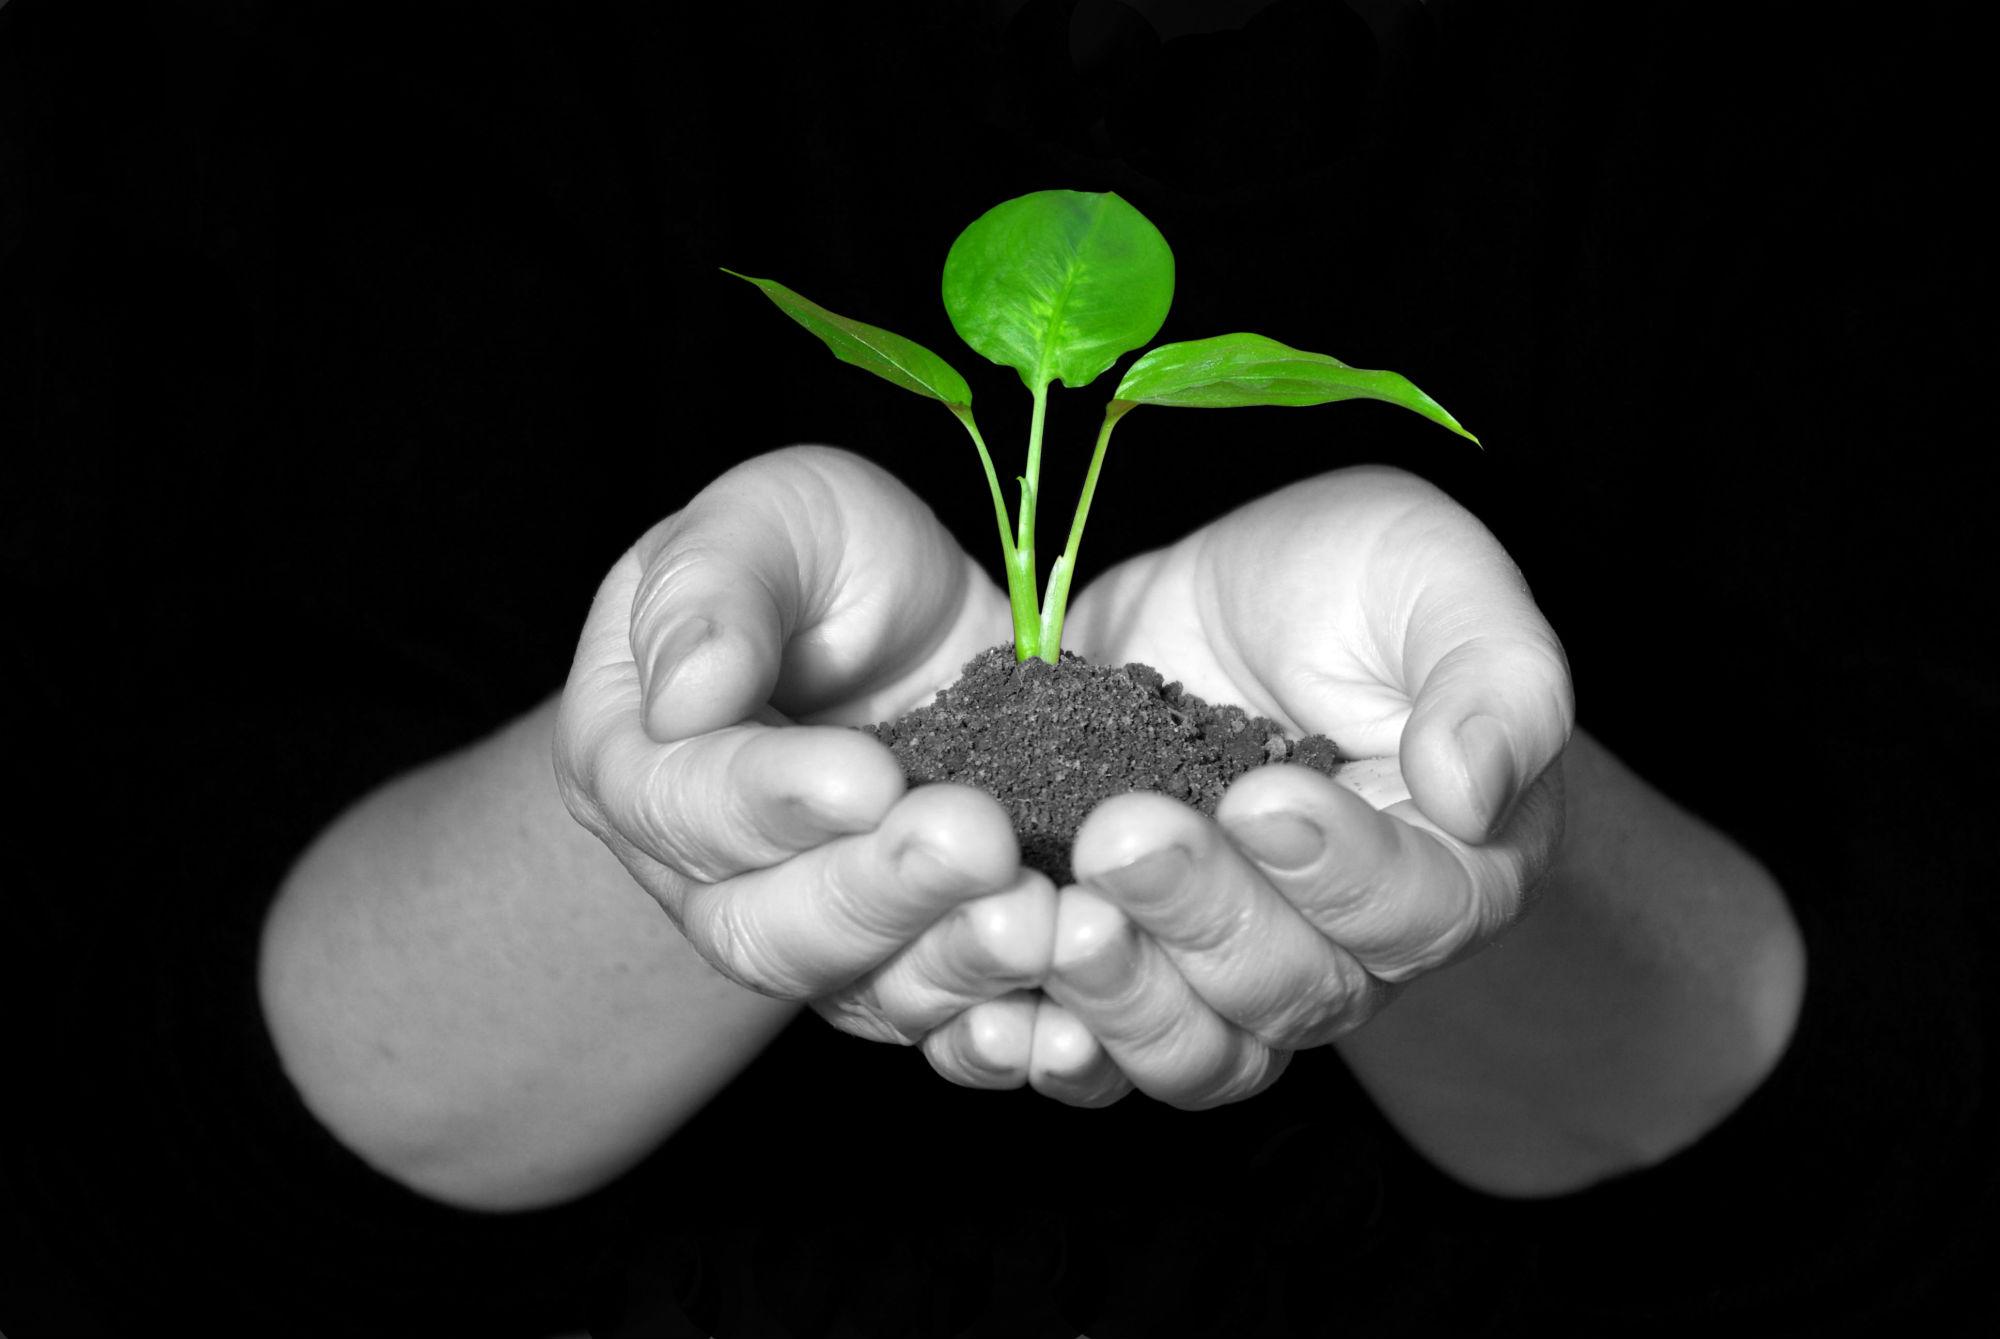 plant growing from hands, nurturing.jpg